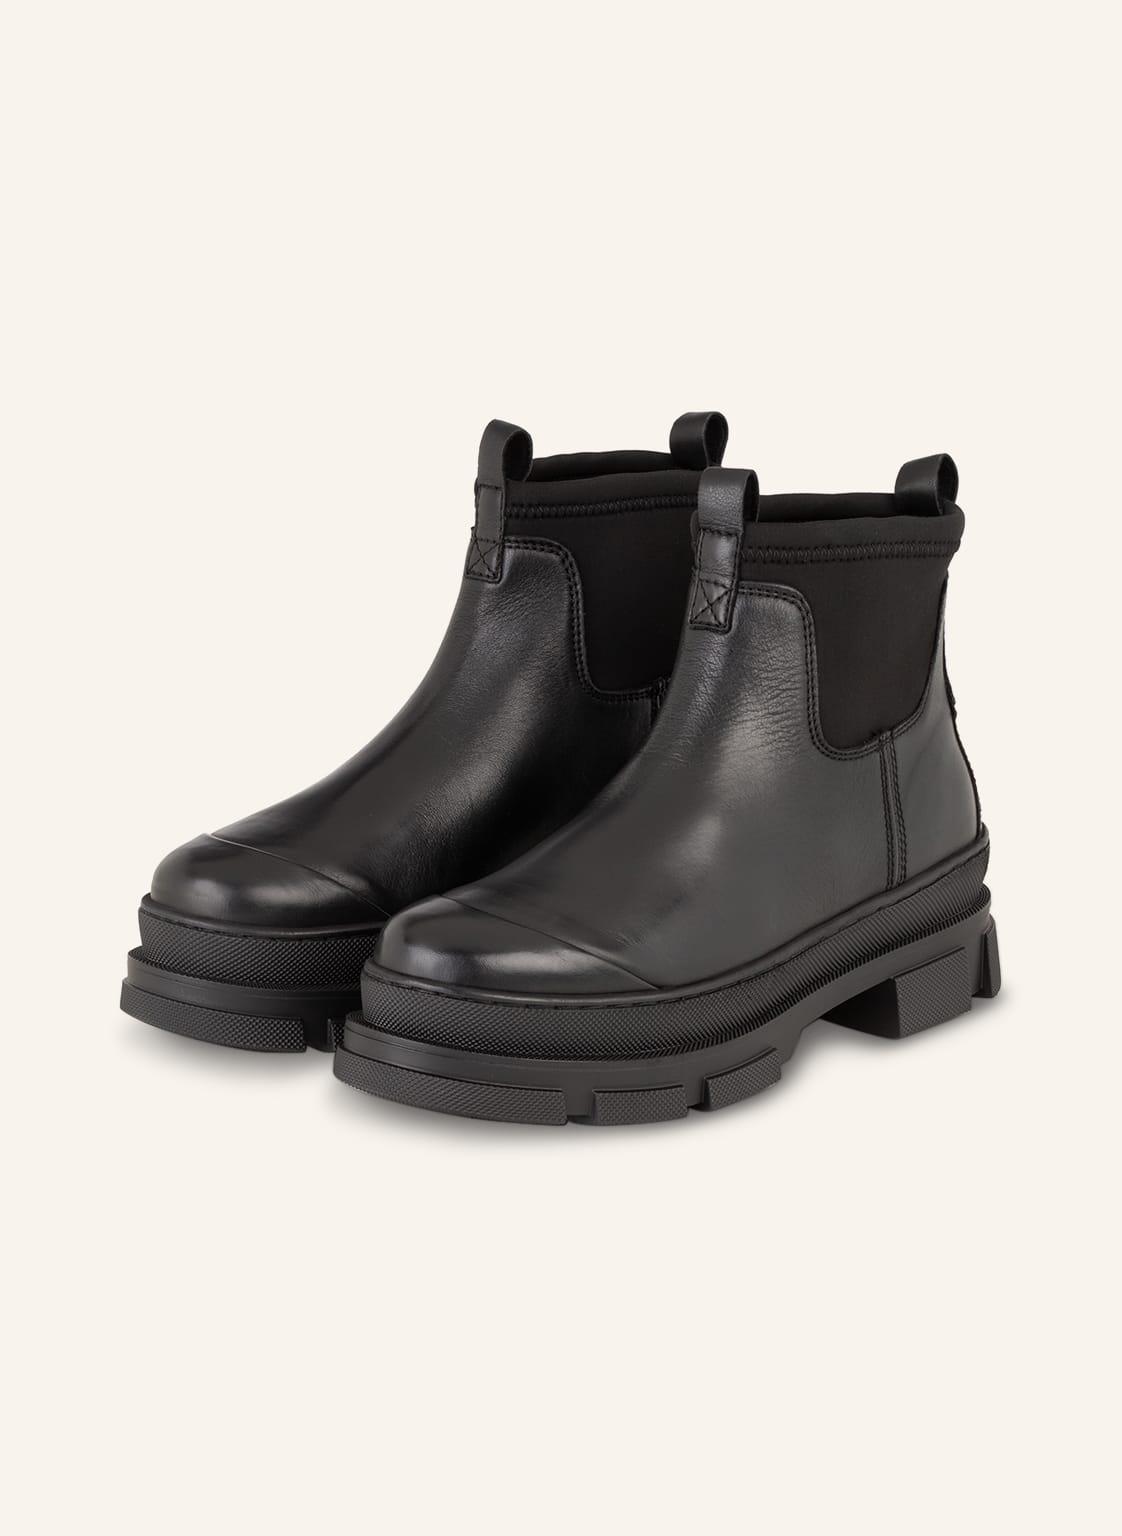 Image of Aldo Chelsea-Boots Puddle schwarz